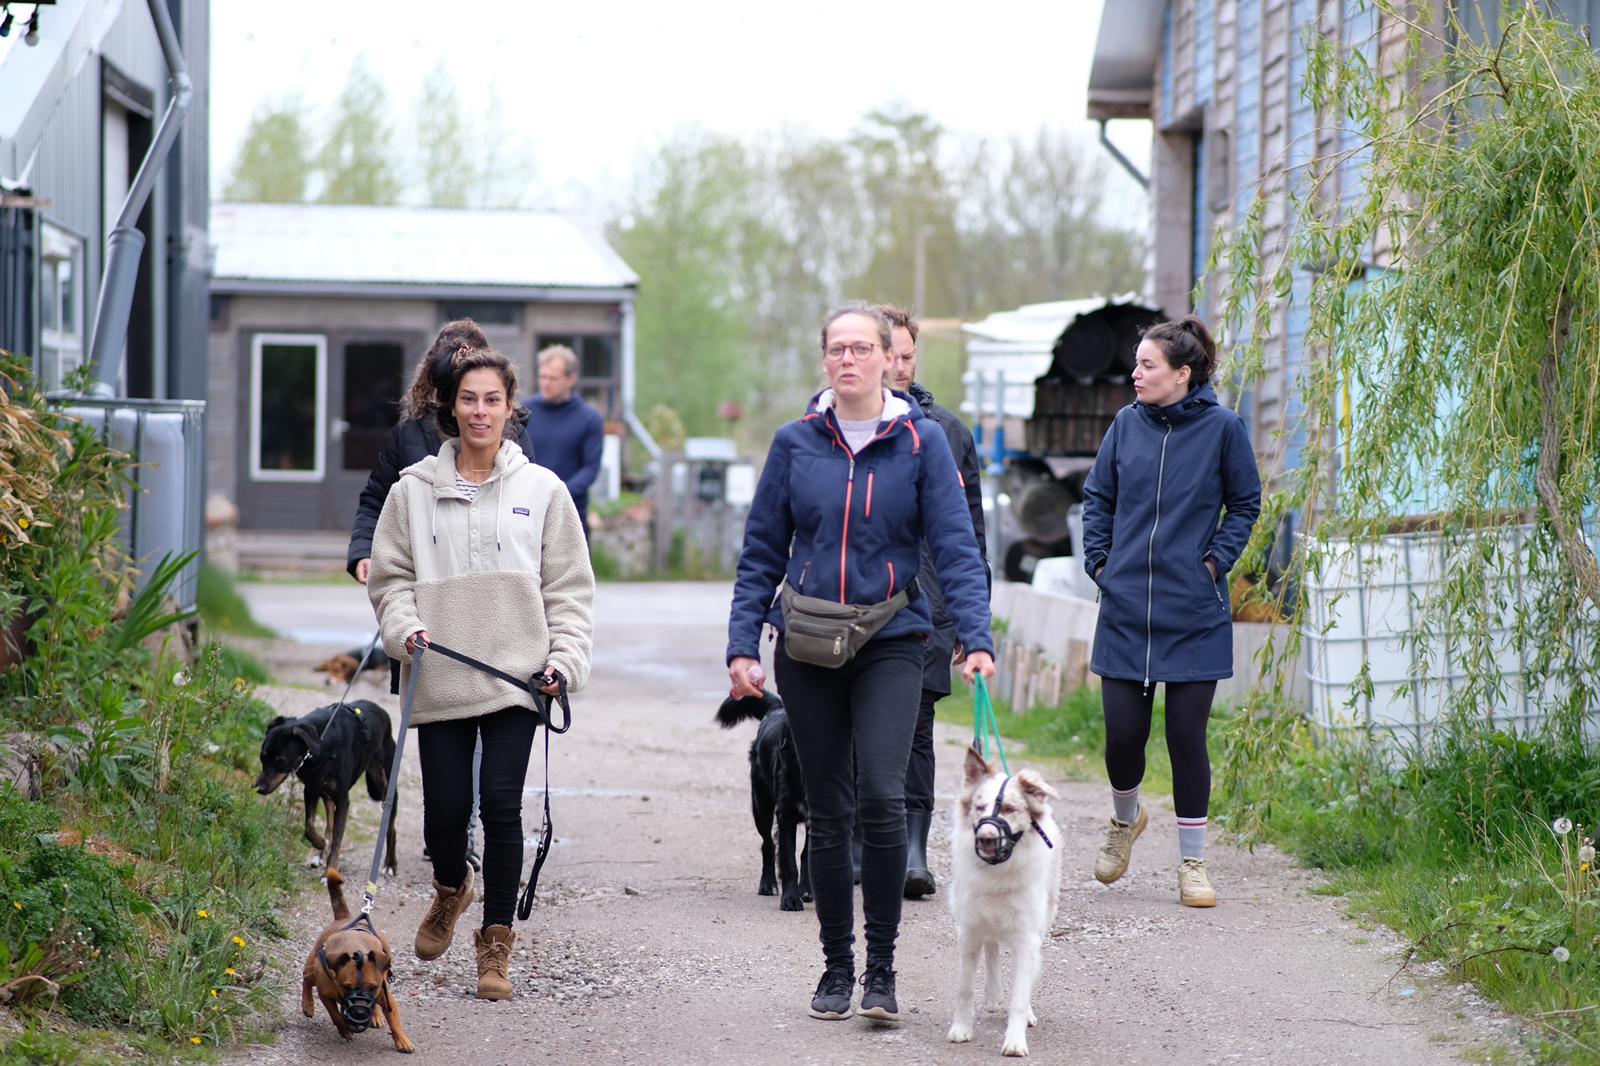 Hondenwandeling_Groningen